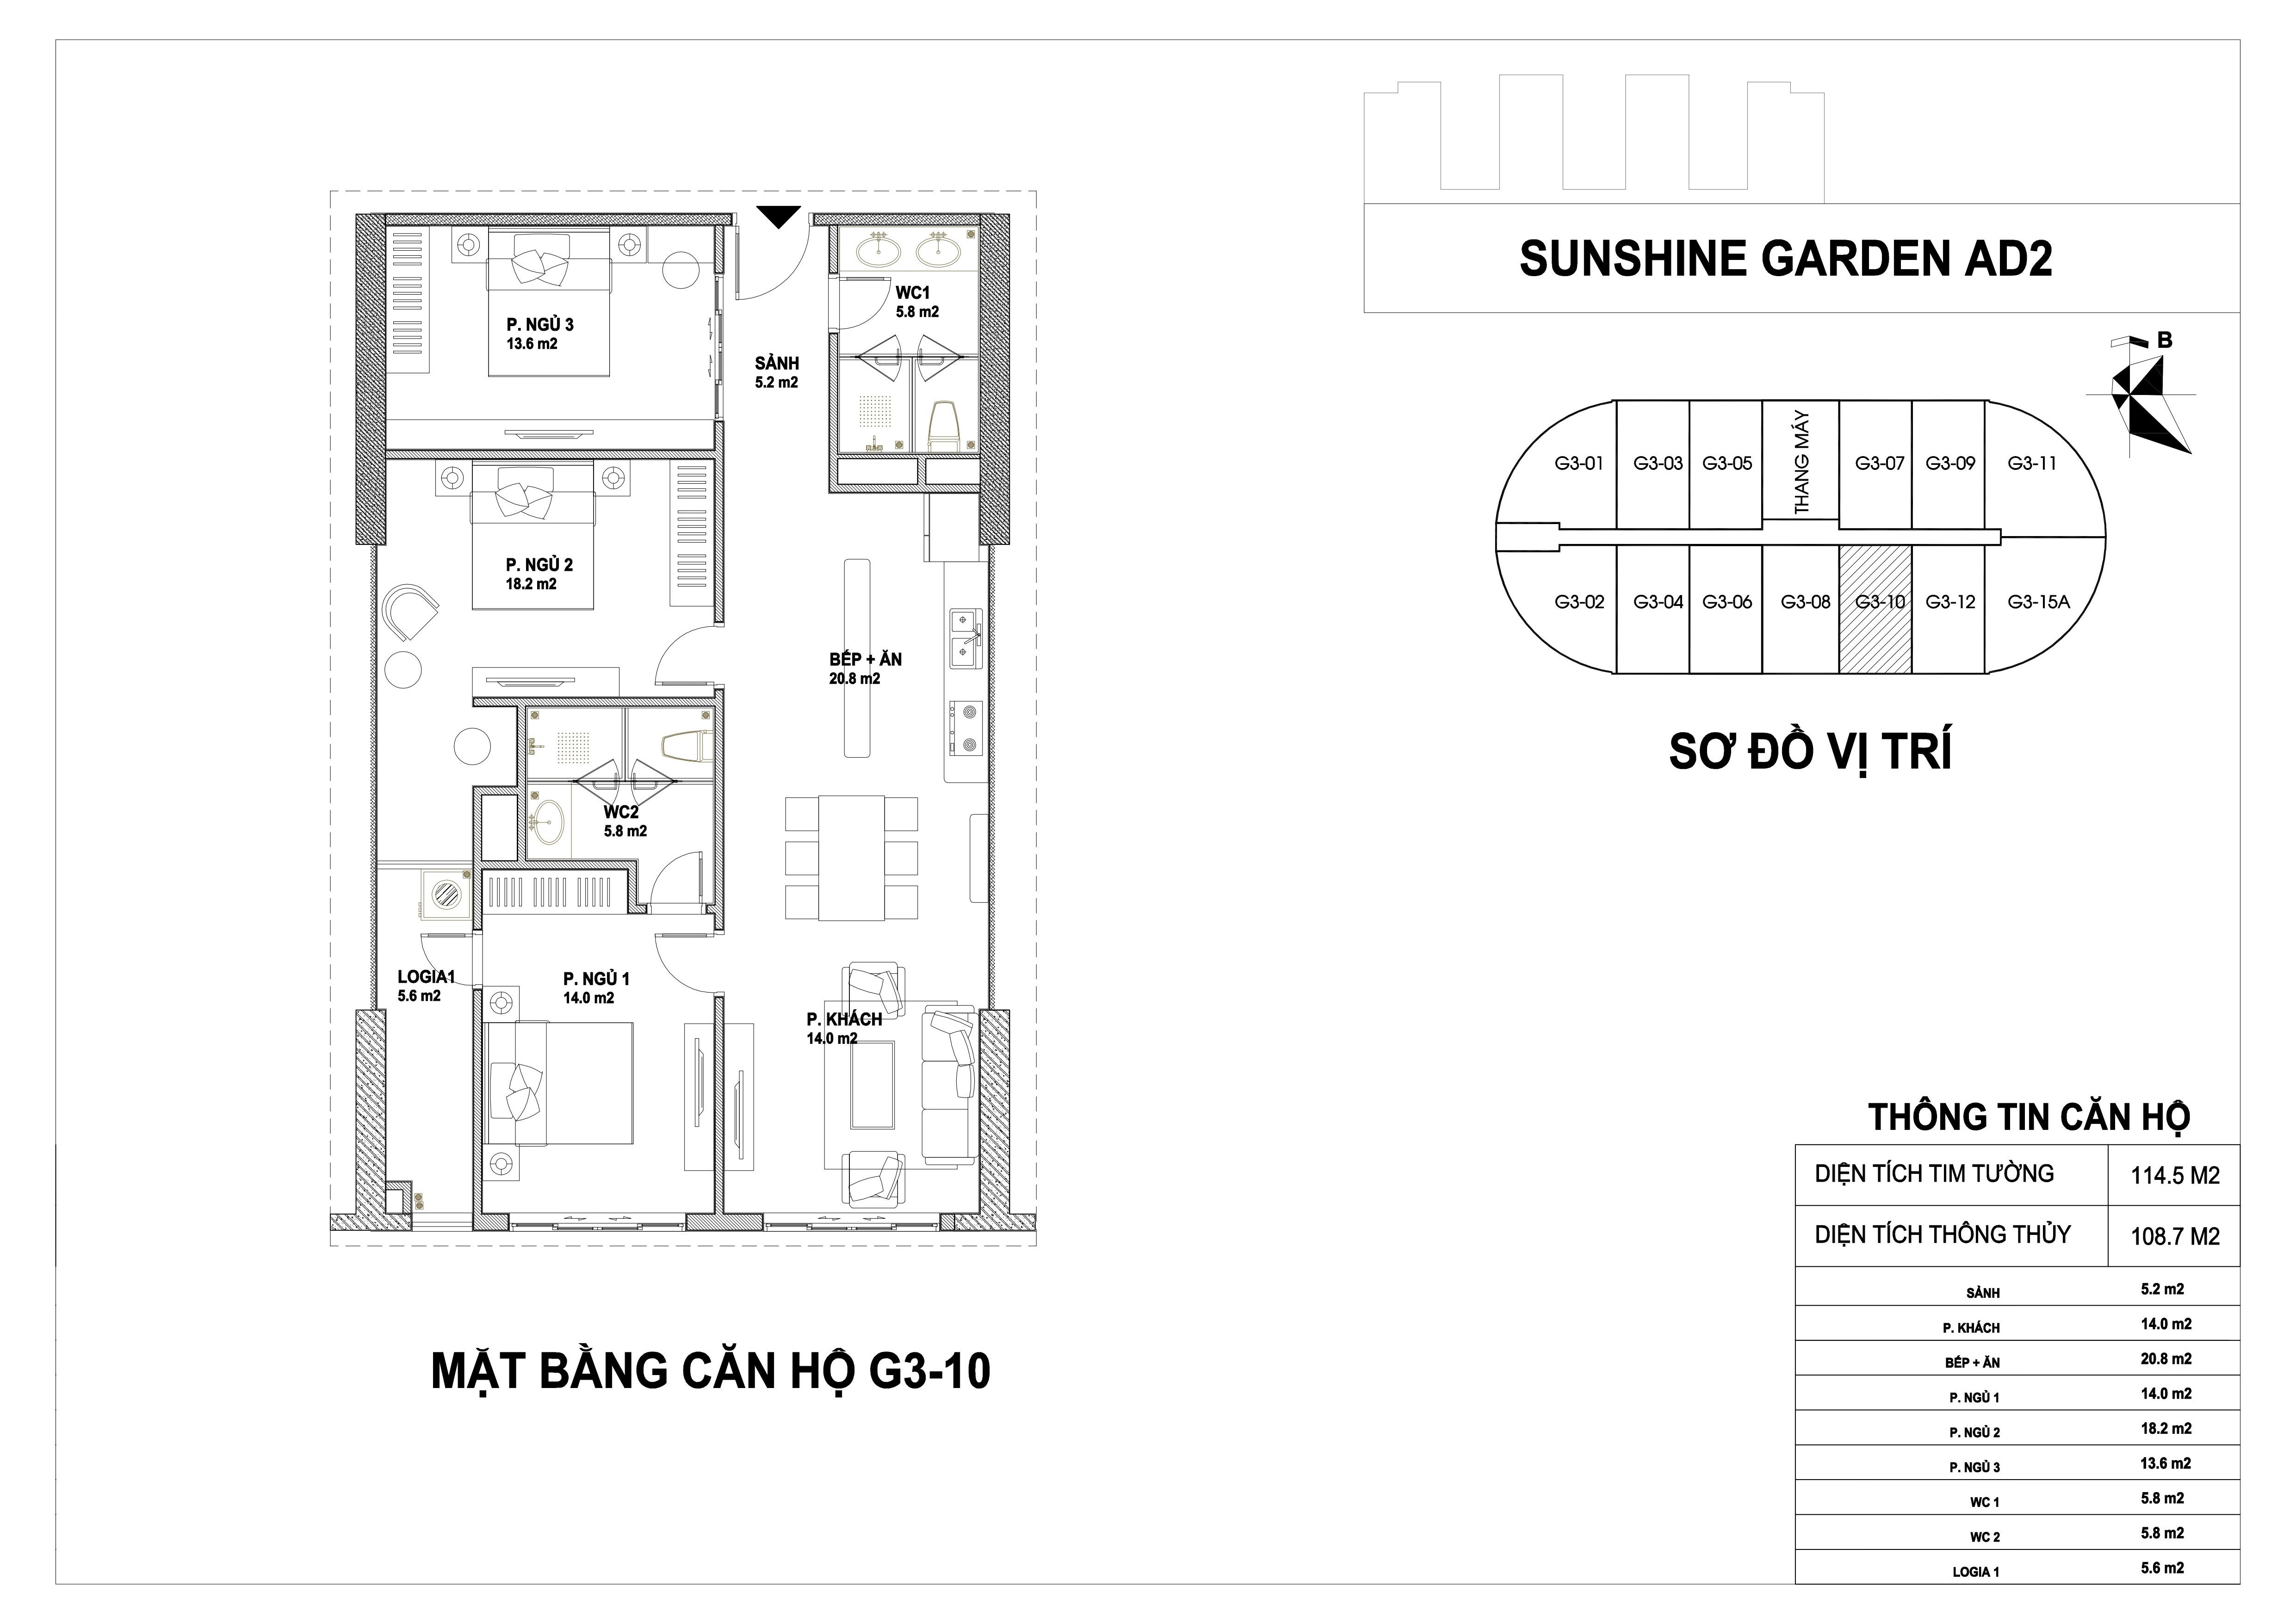 mặt bằng dự án căn hộ Sunshine Garden